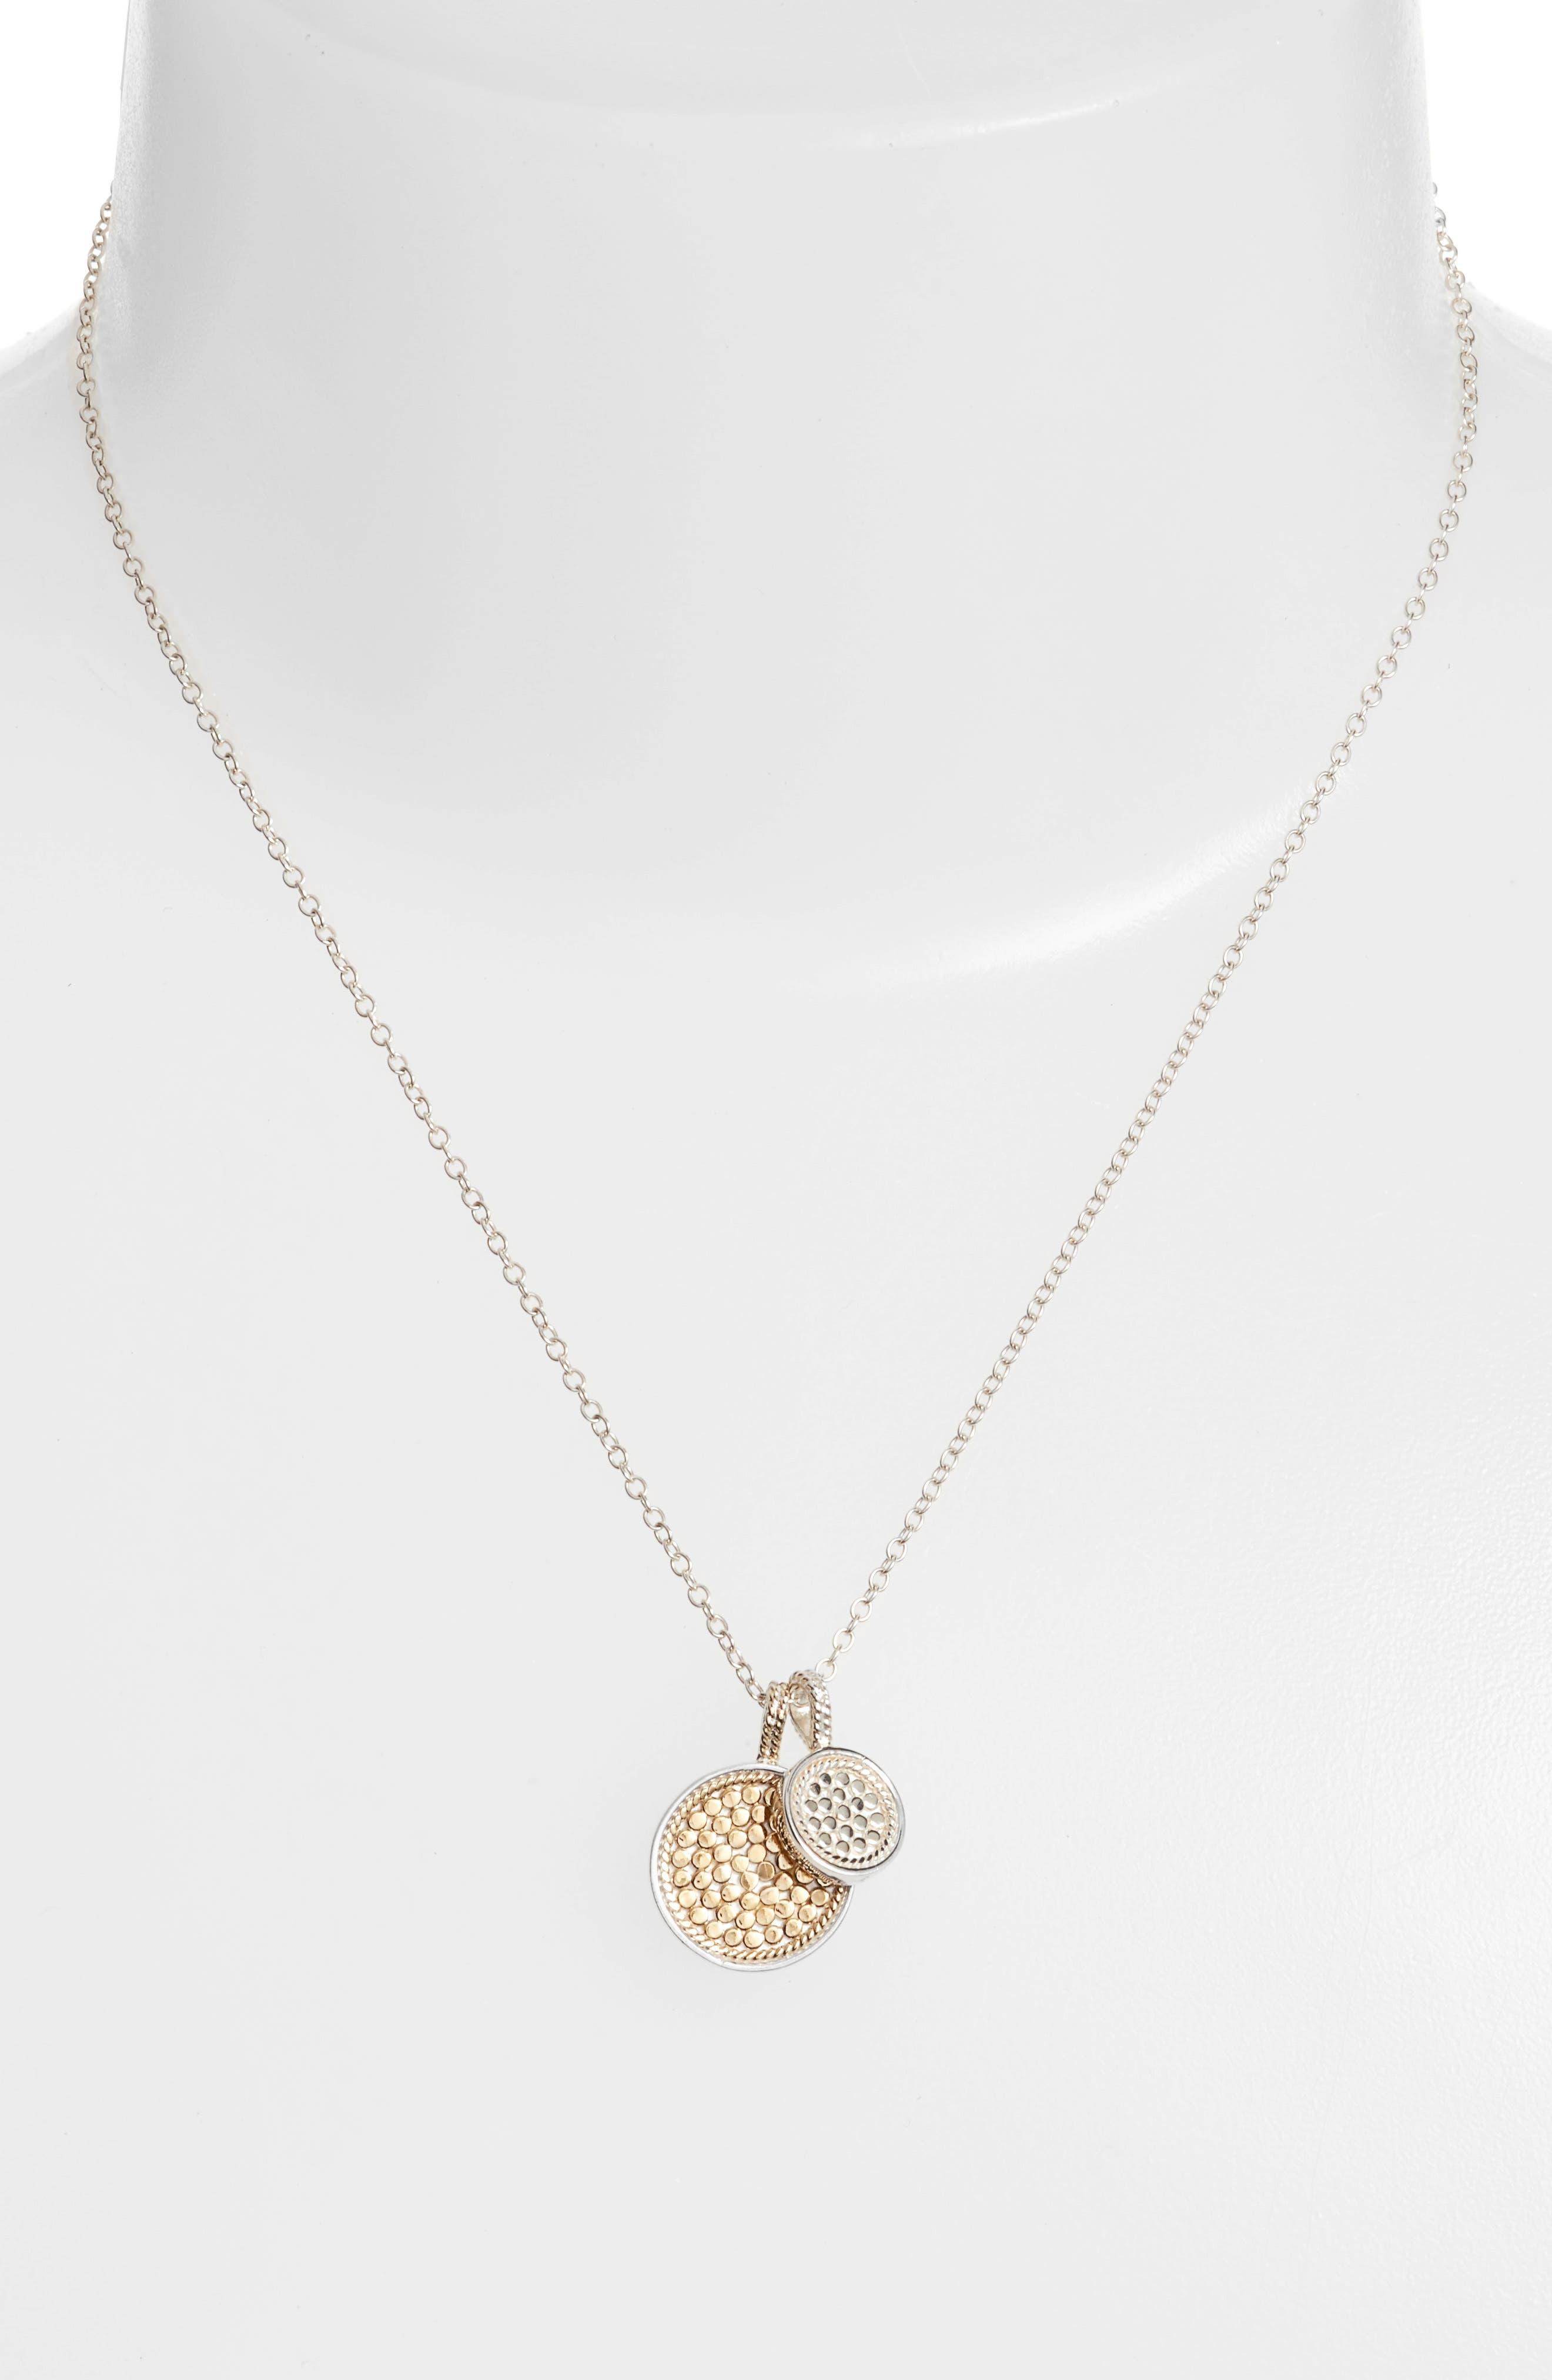 Reversible Disc Pendant Necklace,                             Main thumbnail 1, color,                             Gold/ Silver